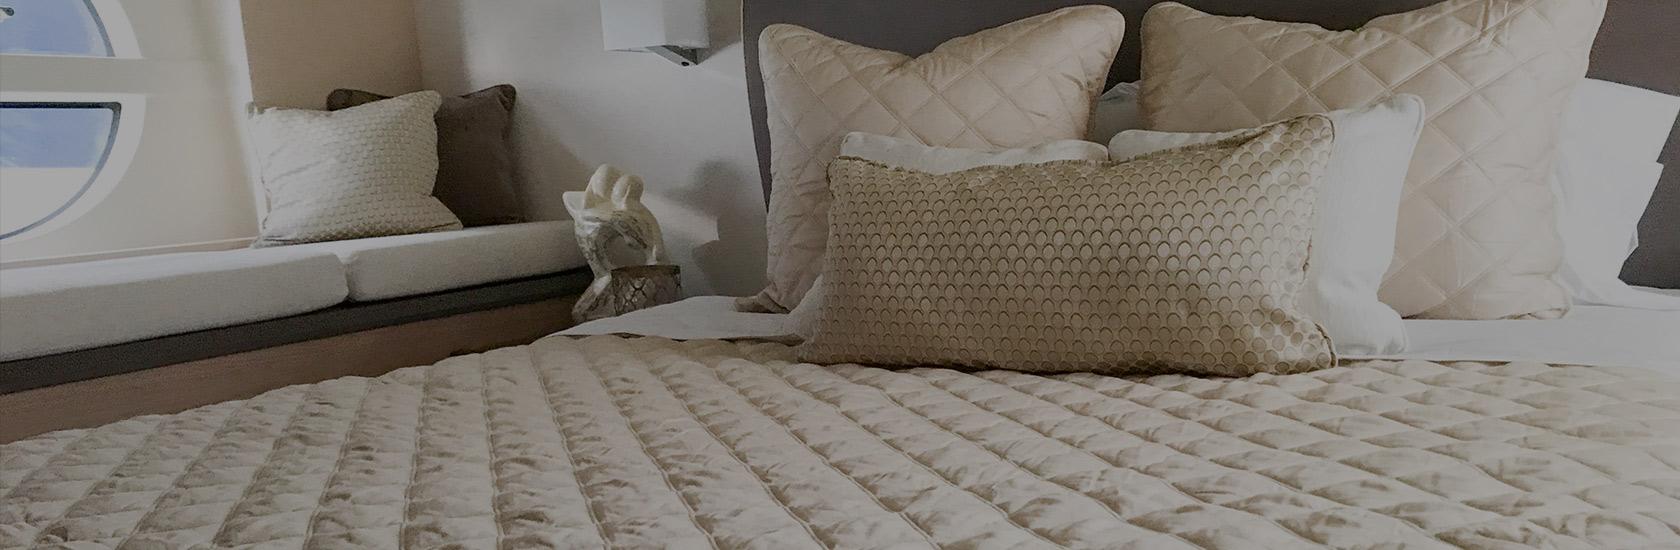 Custom Boat Bedding Made Easy Yacht Mattress Sheets Linens Central